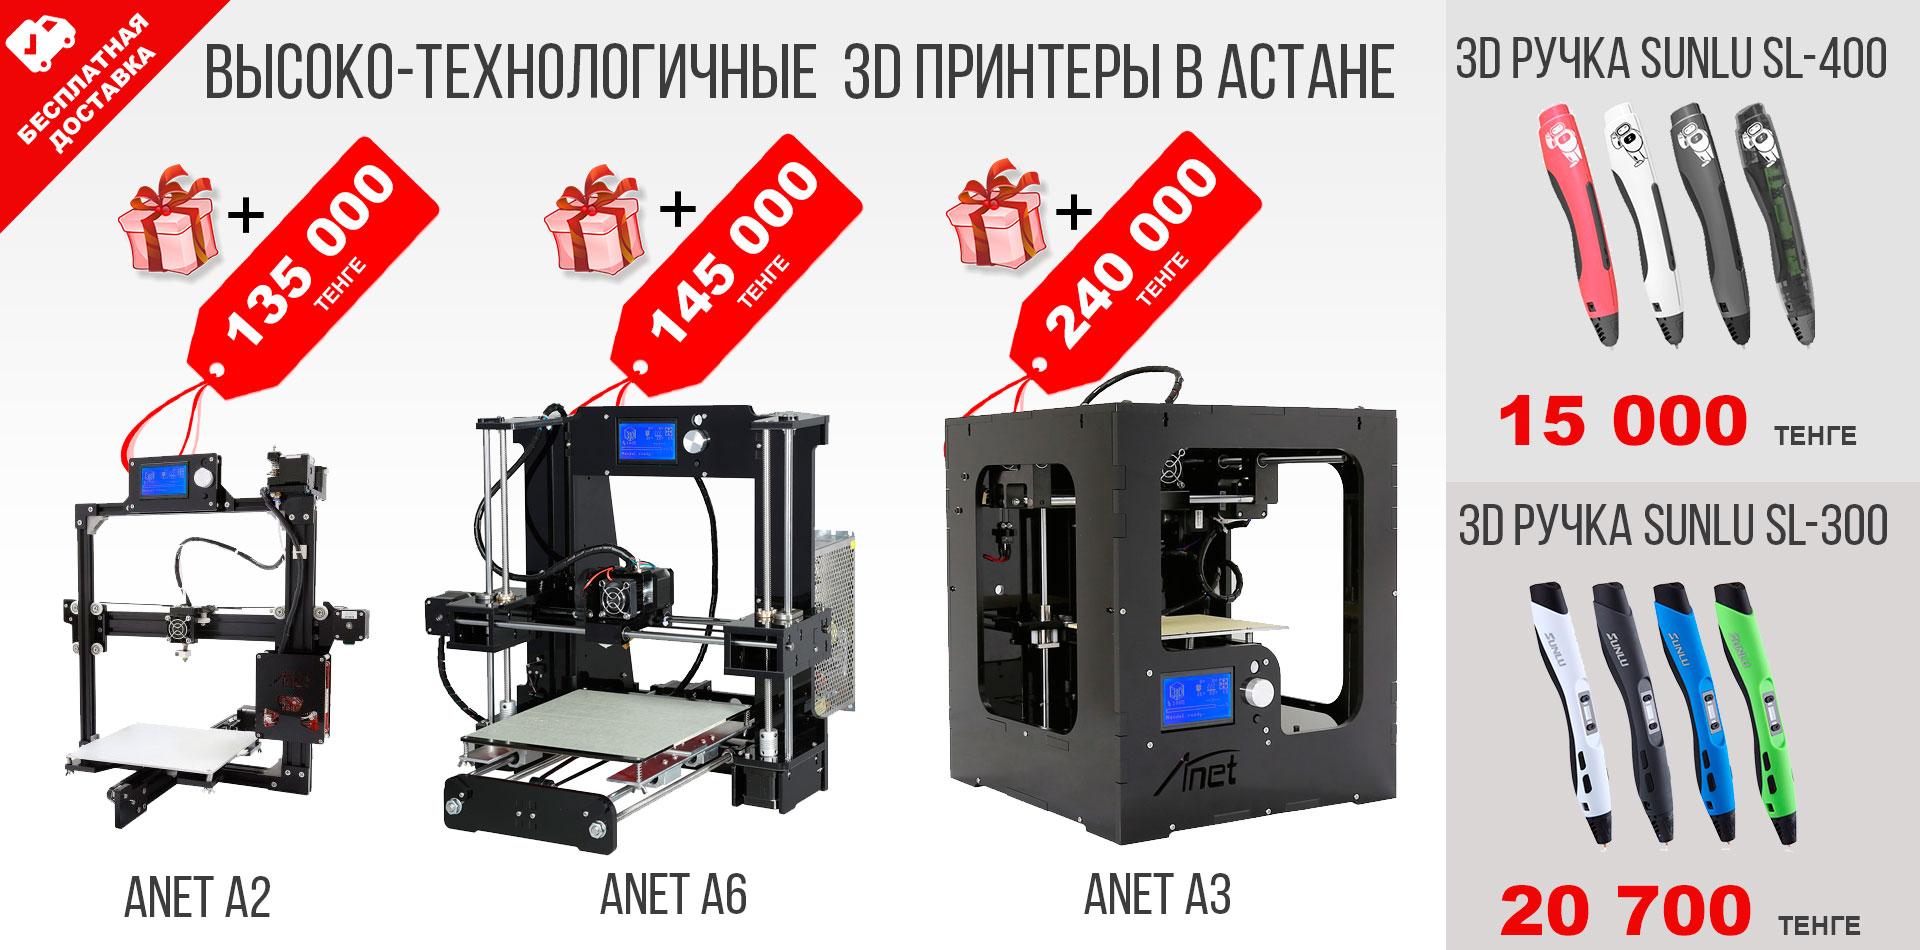 3D ПРИНТЕРЫ ANET